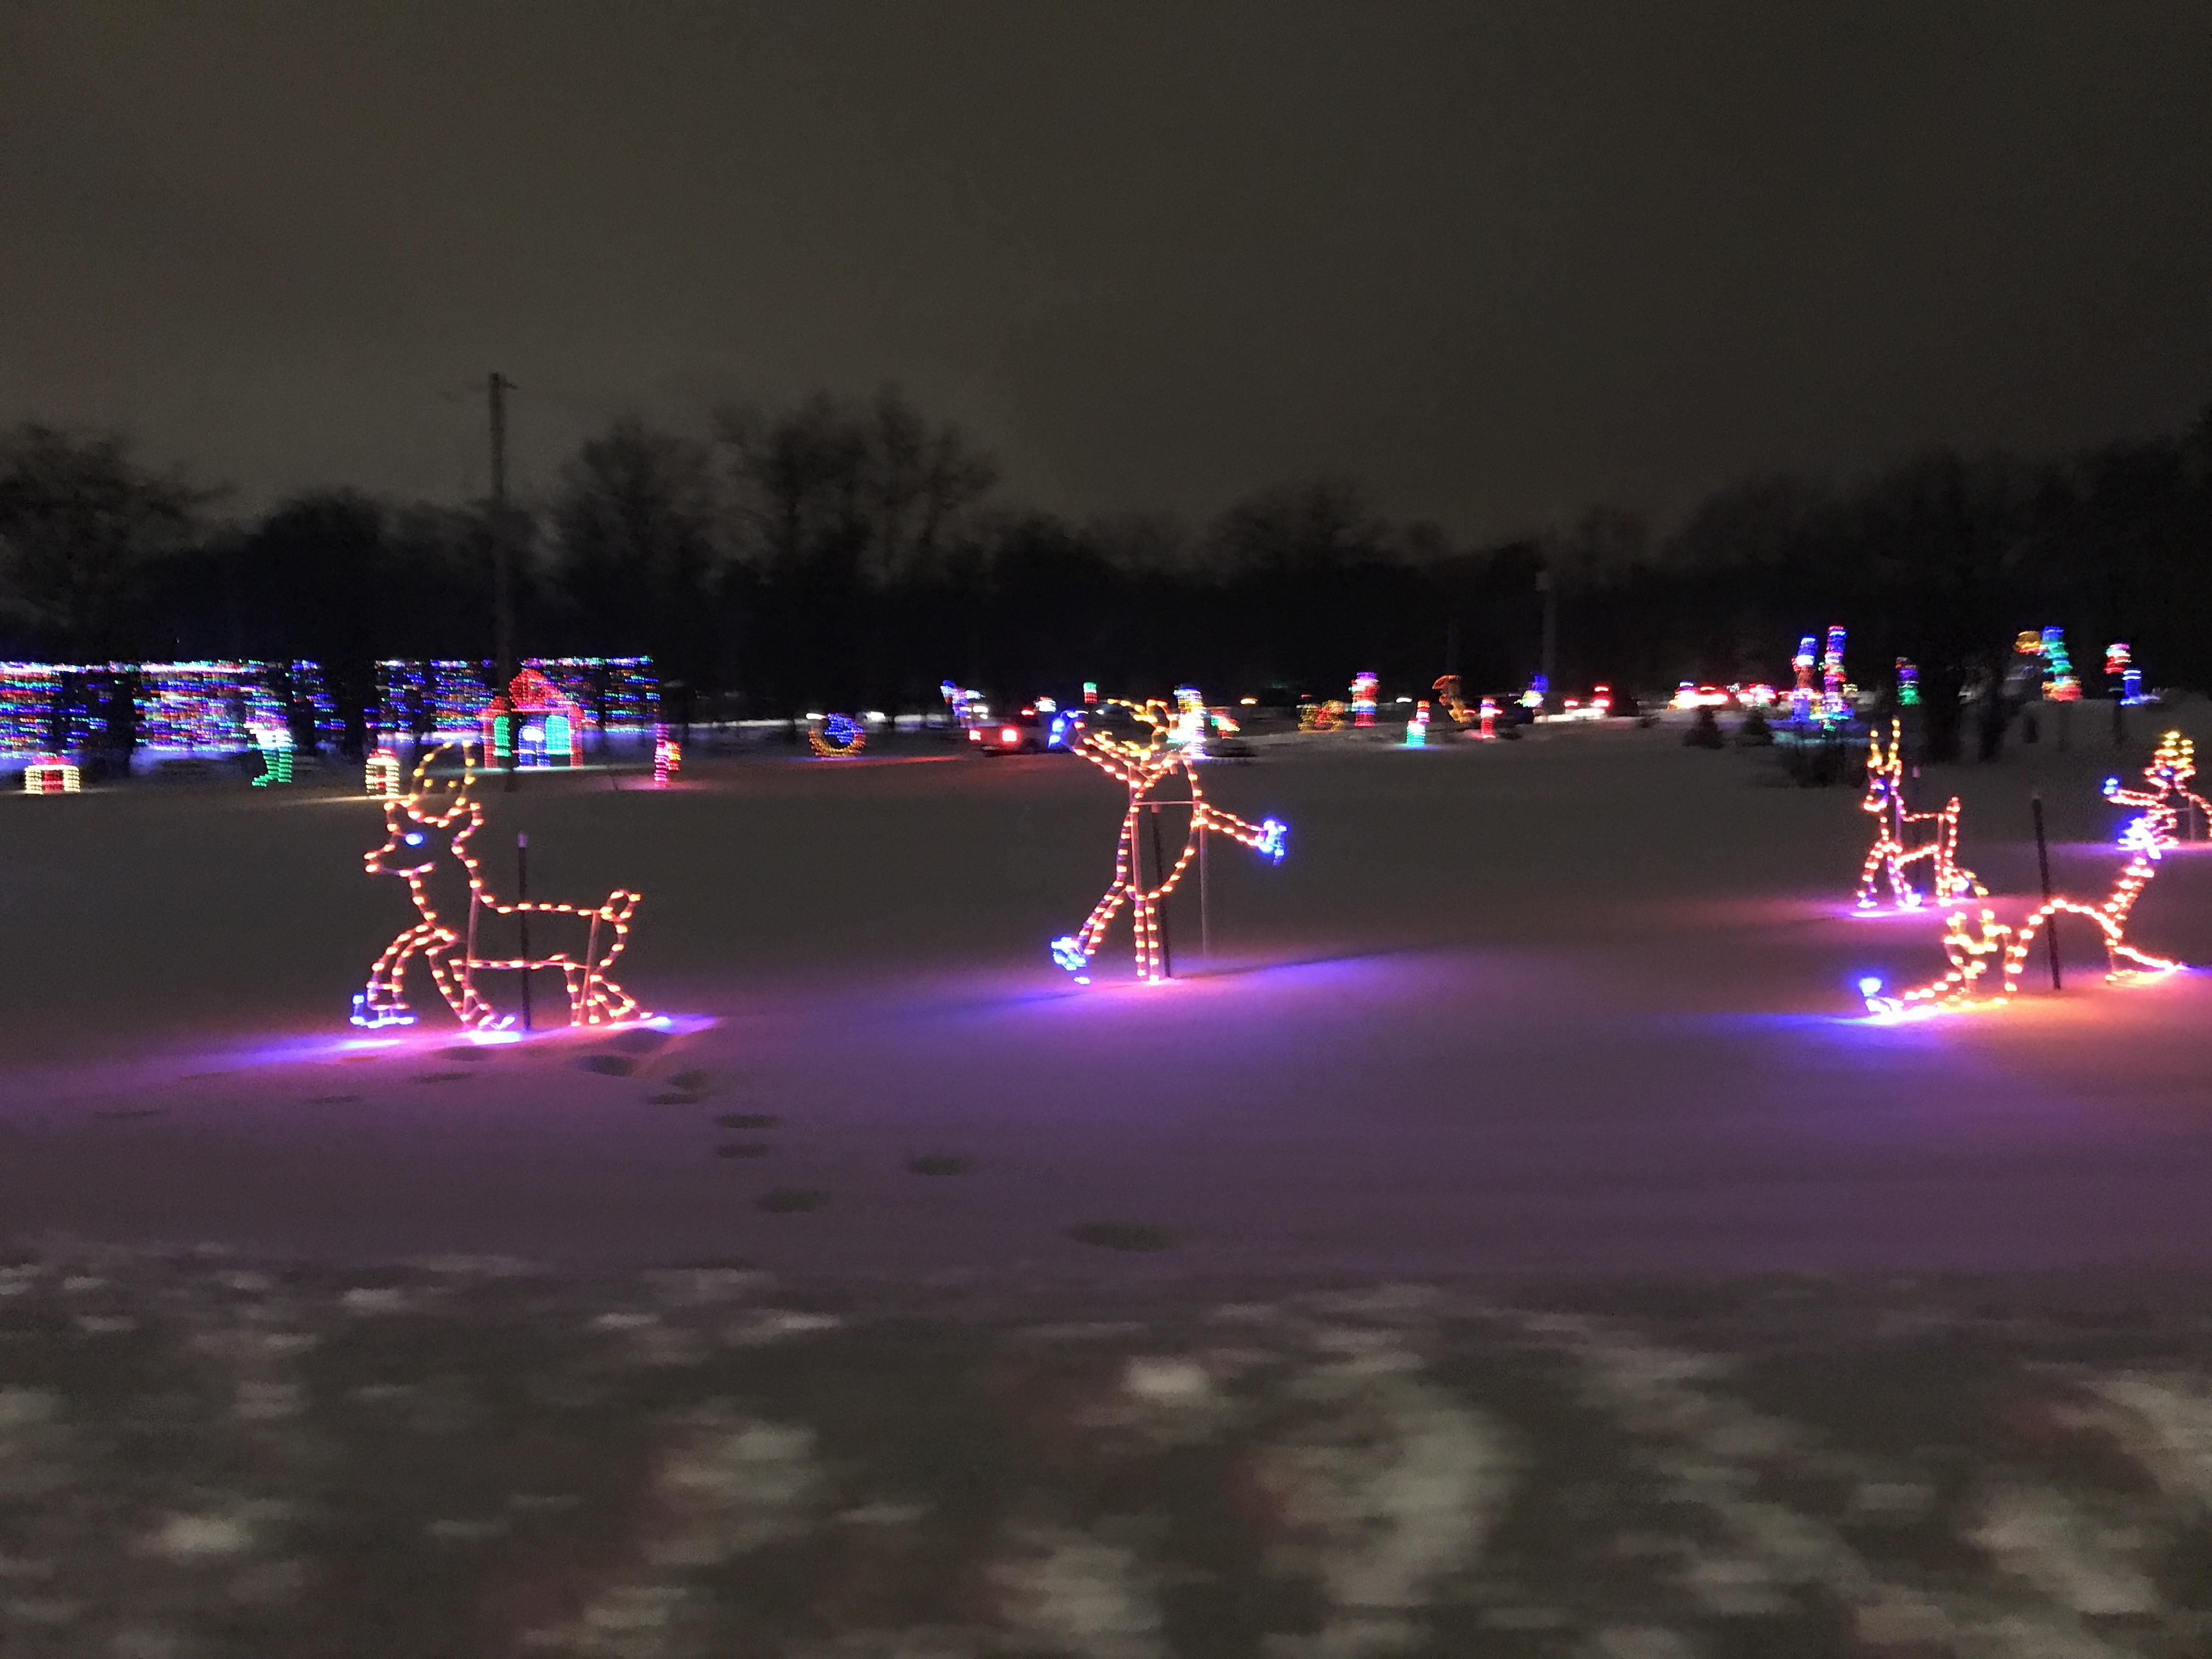 Gifts of Lights - Bingemans